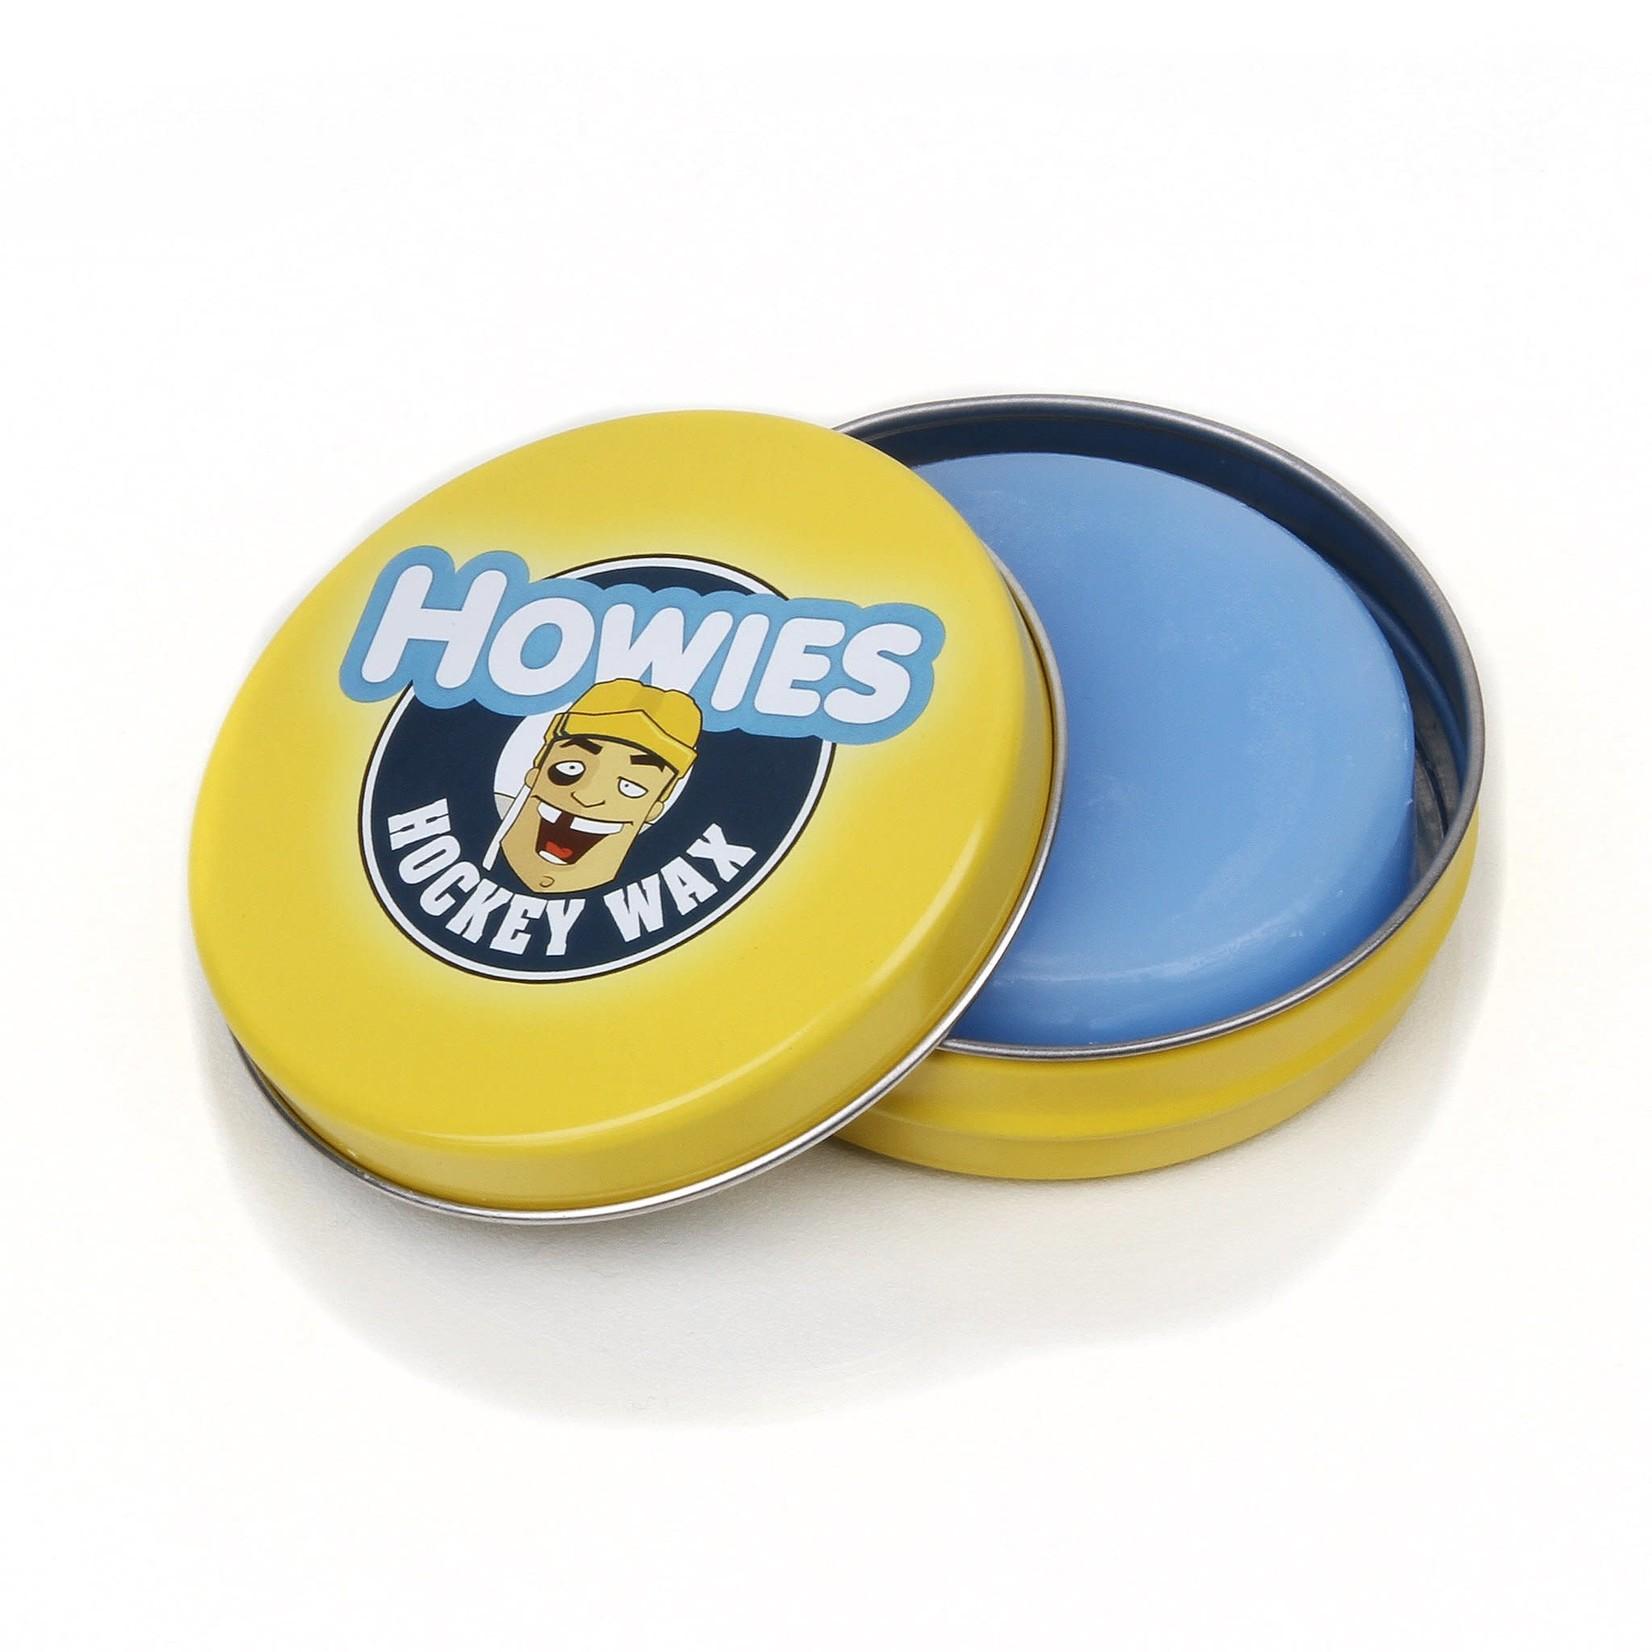 Howies Howies Hockey Stick Wax